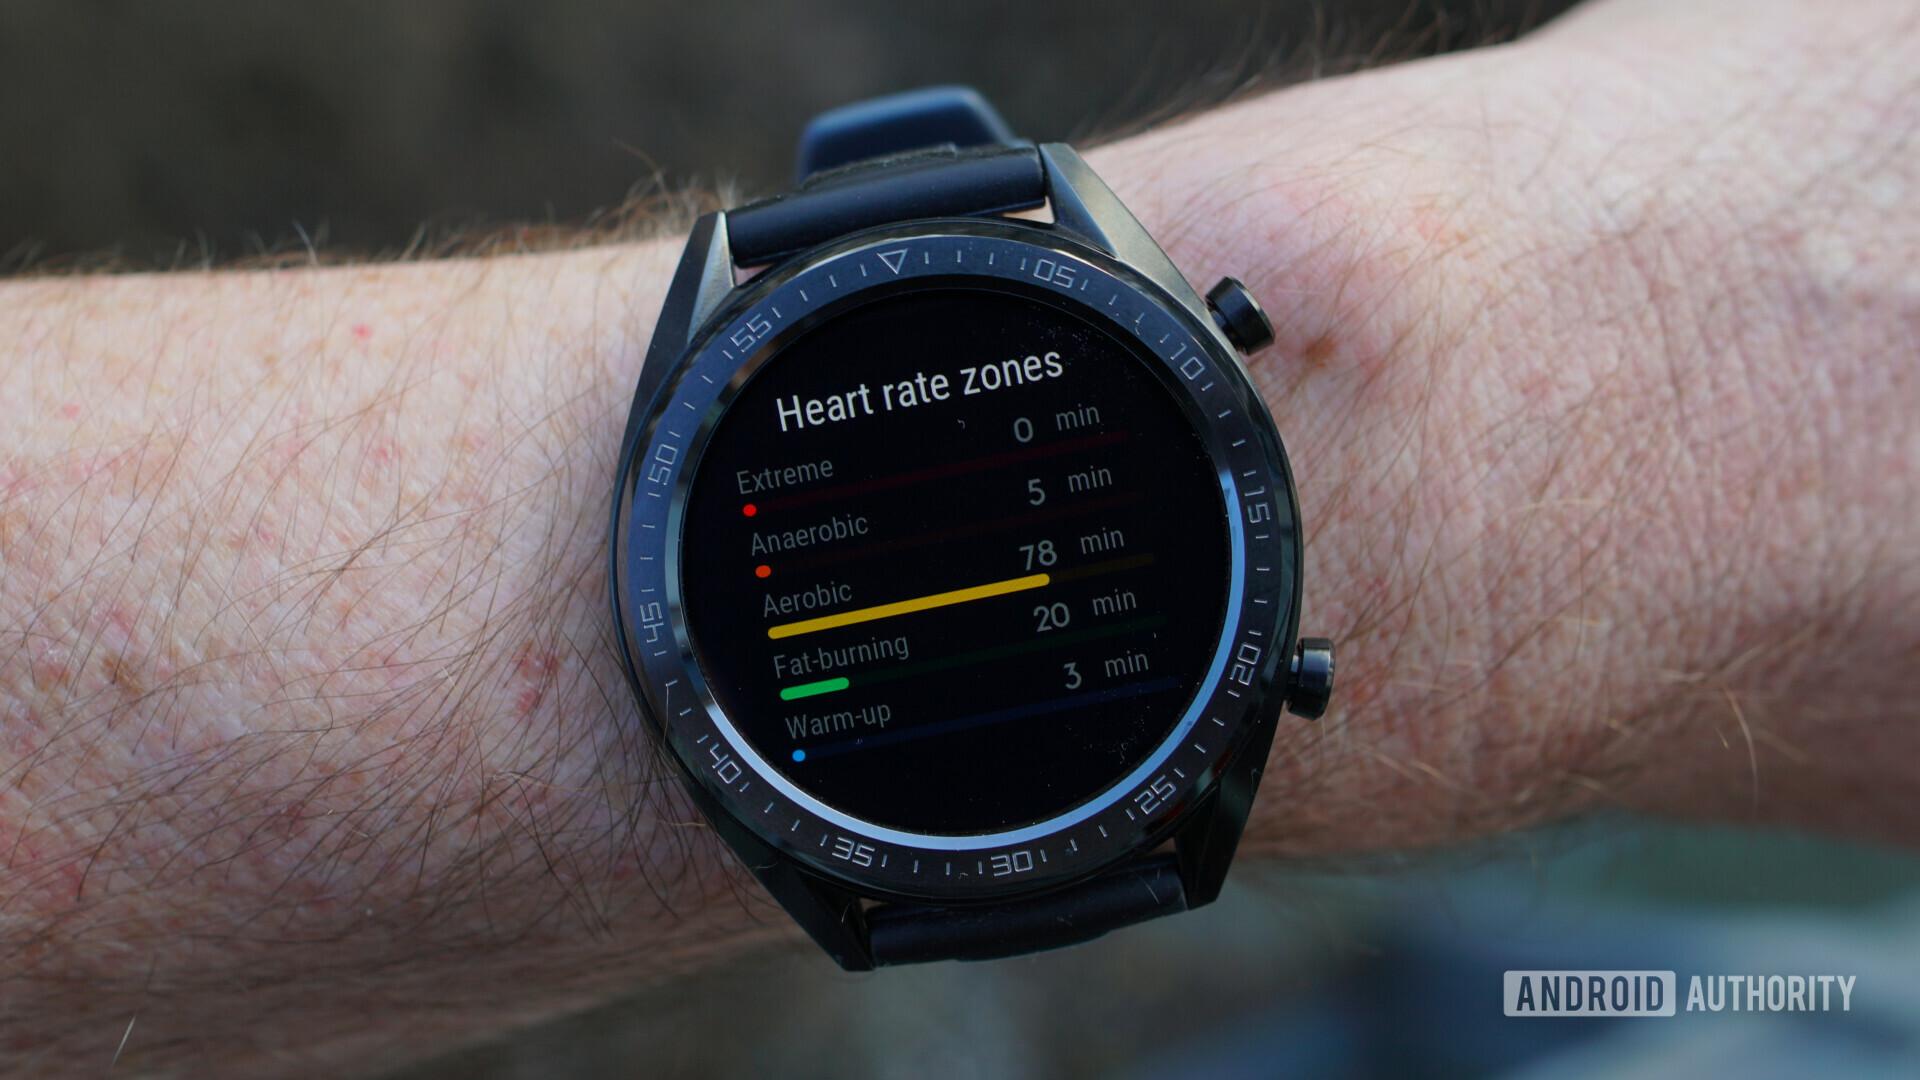 Huawei Watch GT heart rate zones